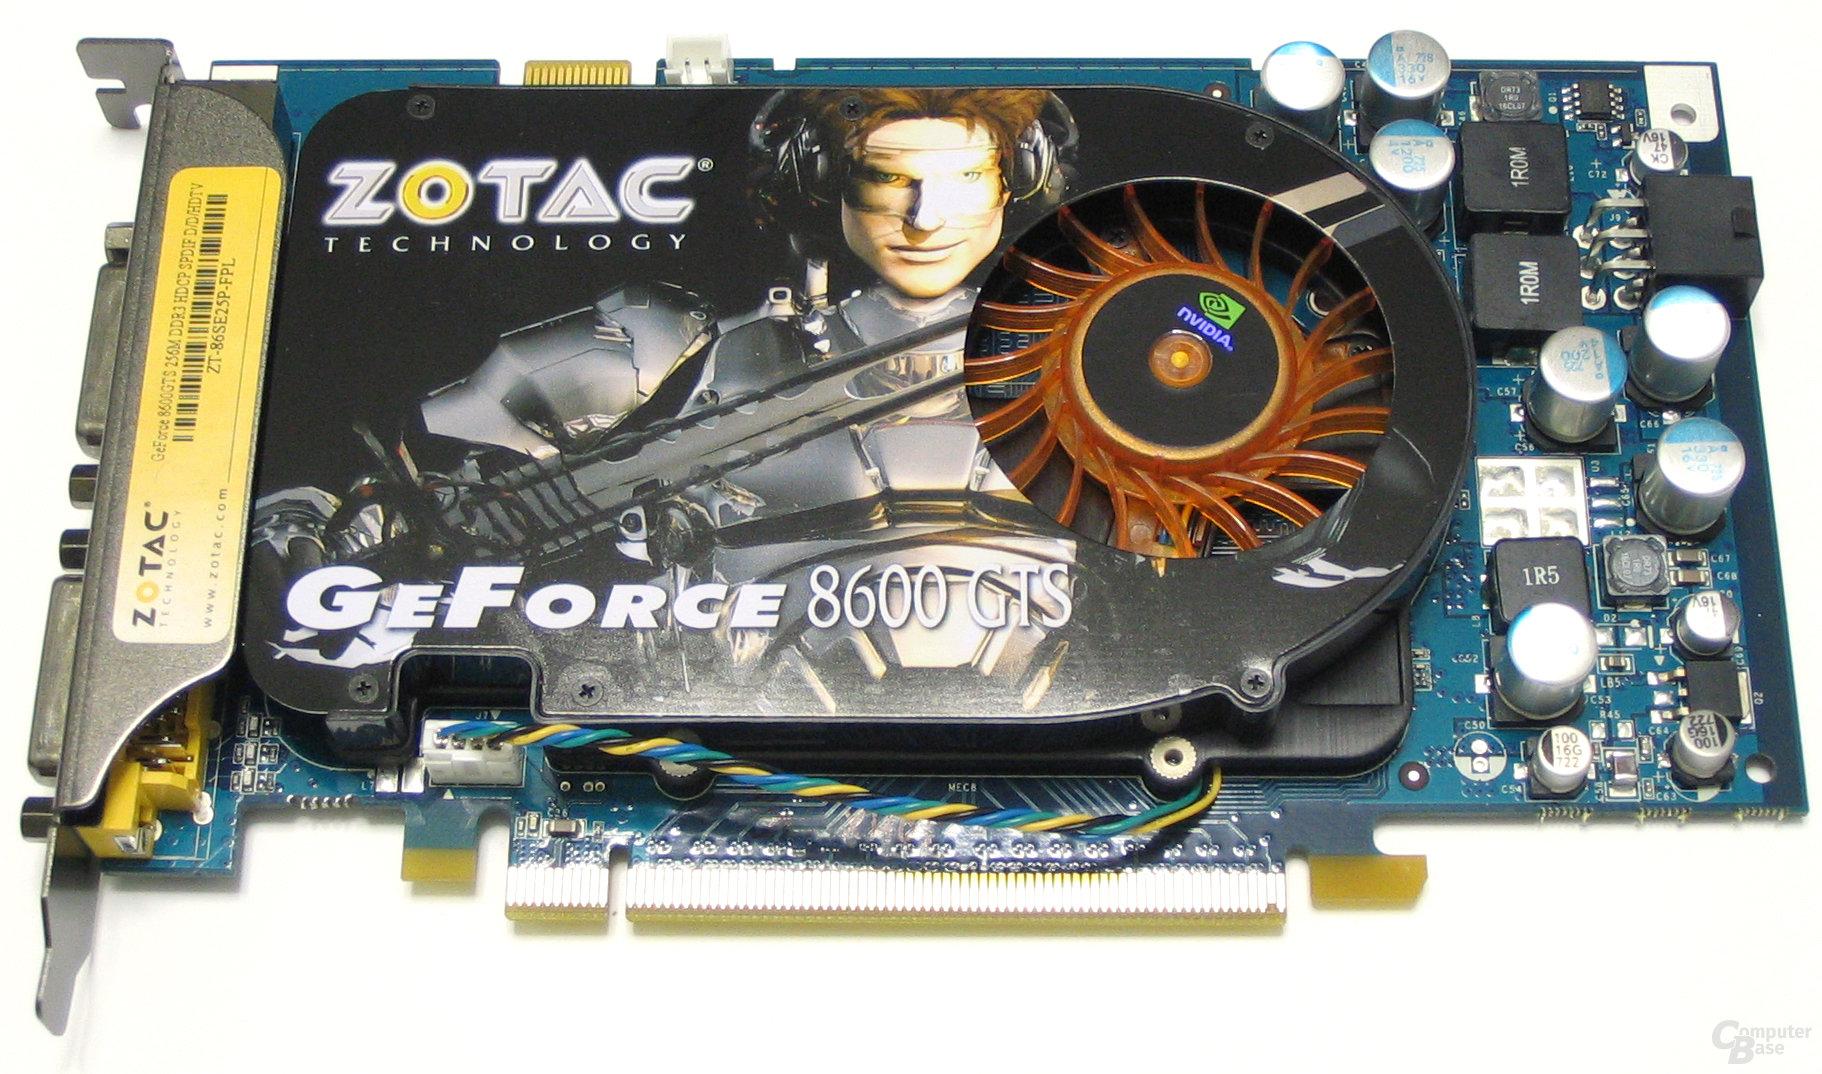 Zotac GeForce 8600 GTS AMP! Edition